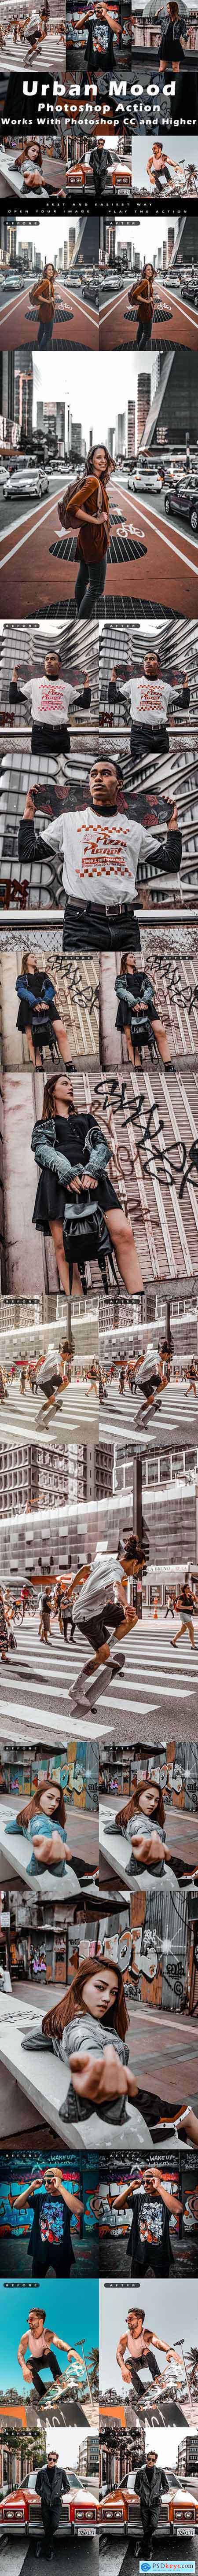 Urban Mood - Photoshop Action 29183095